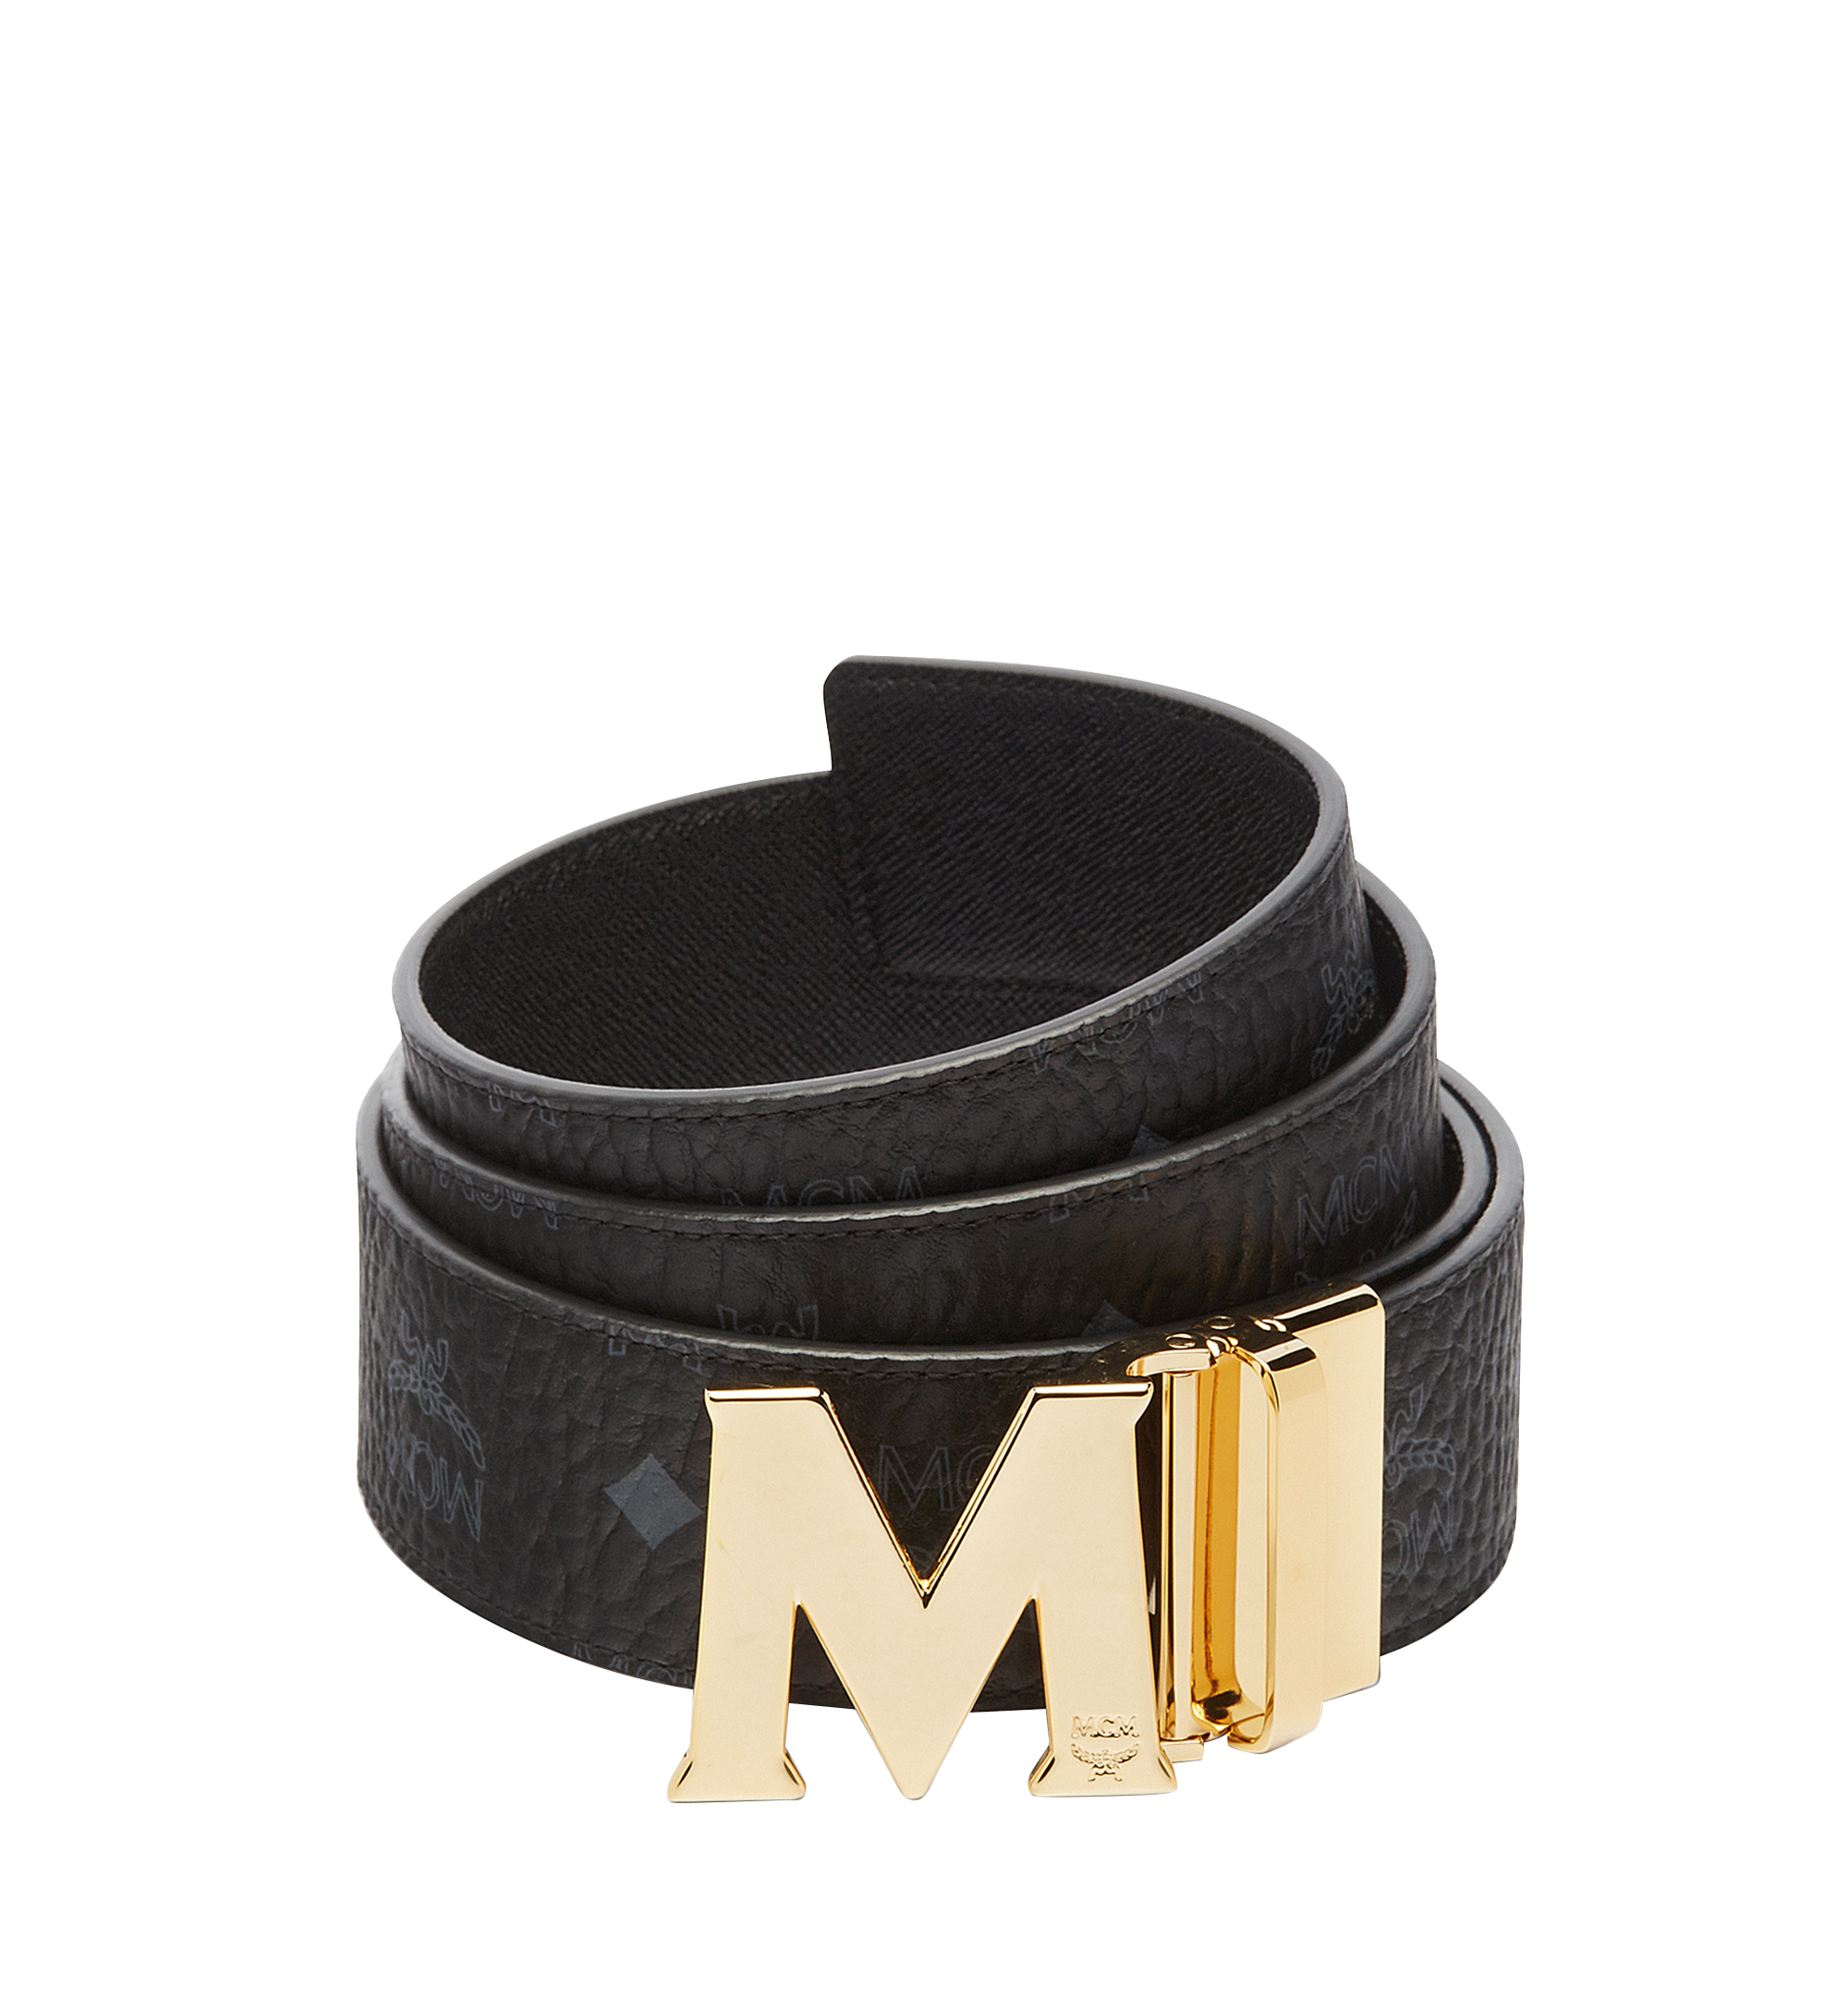 MCM Claus Reversible Belt 4.5 cm in Visetos Black MXB6AVI04BK001 Alternate View 1